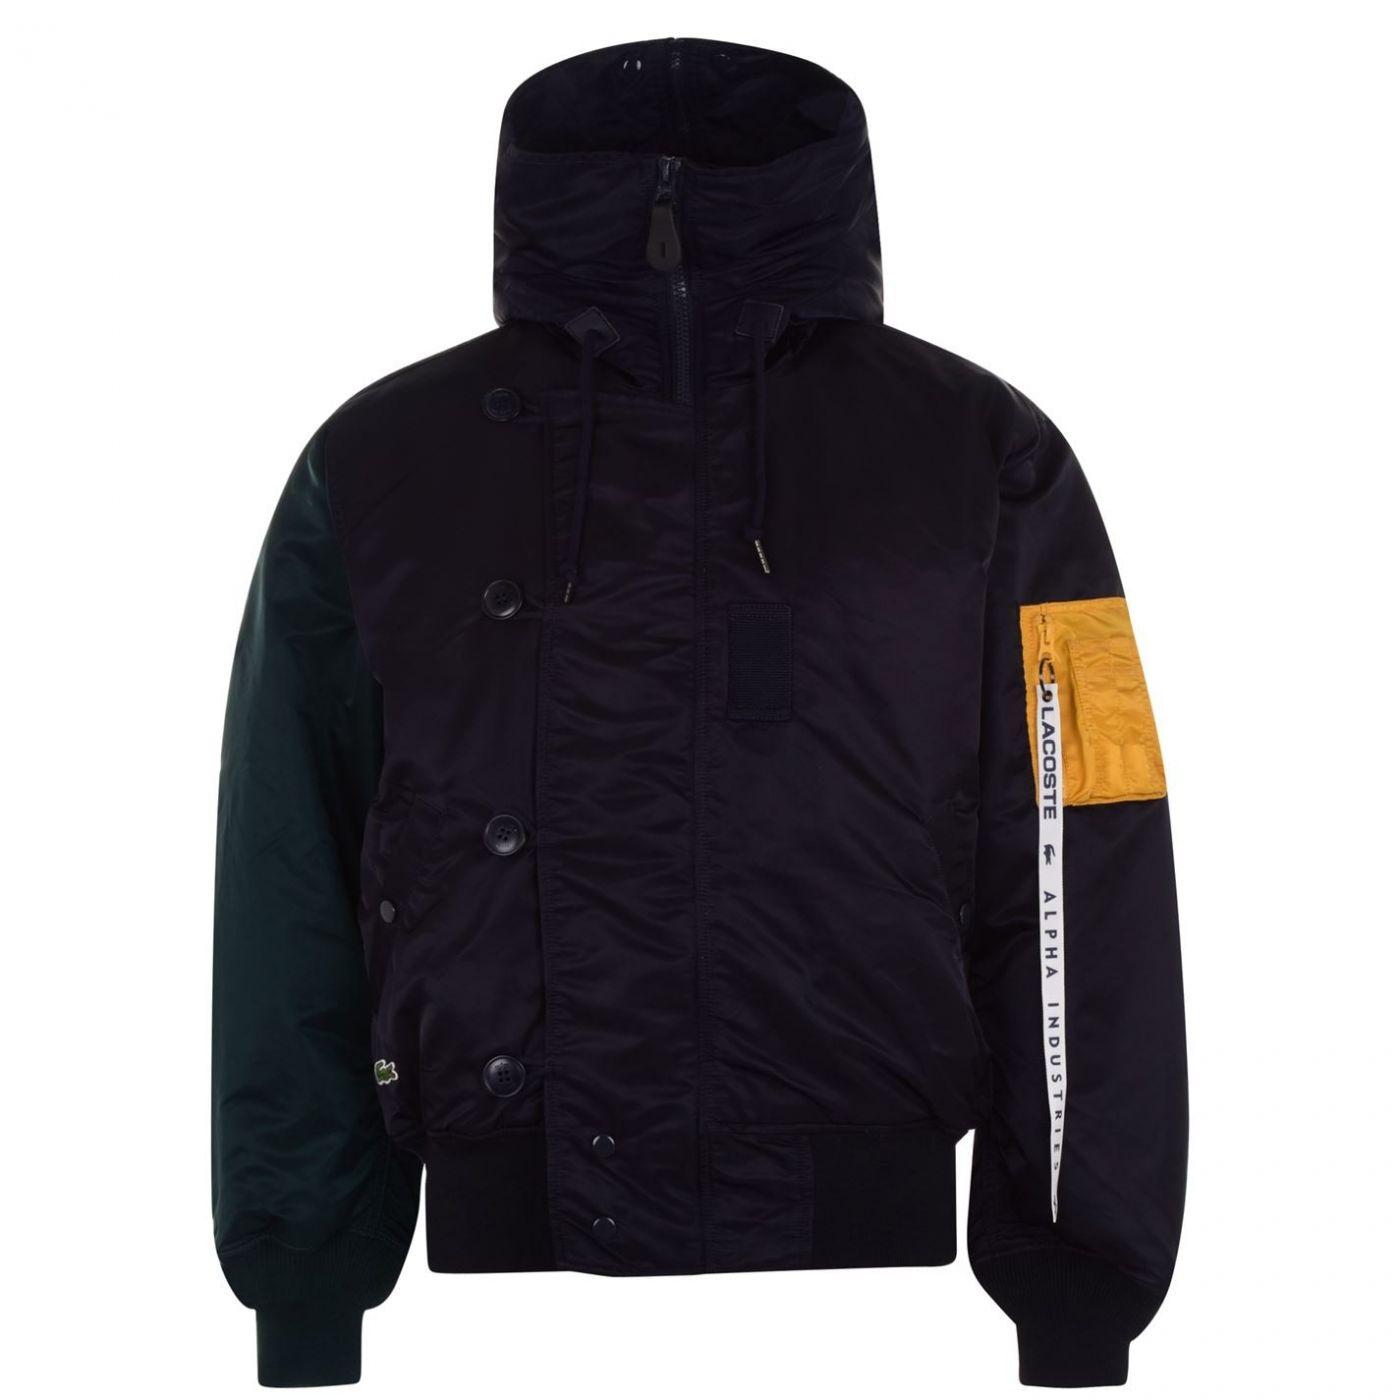 Lacoste Alpha Industries Jacket